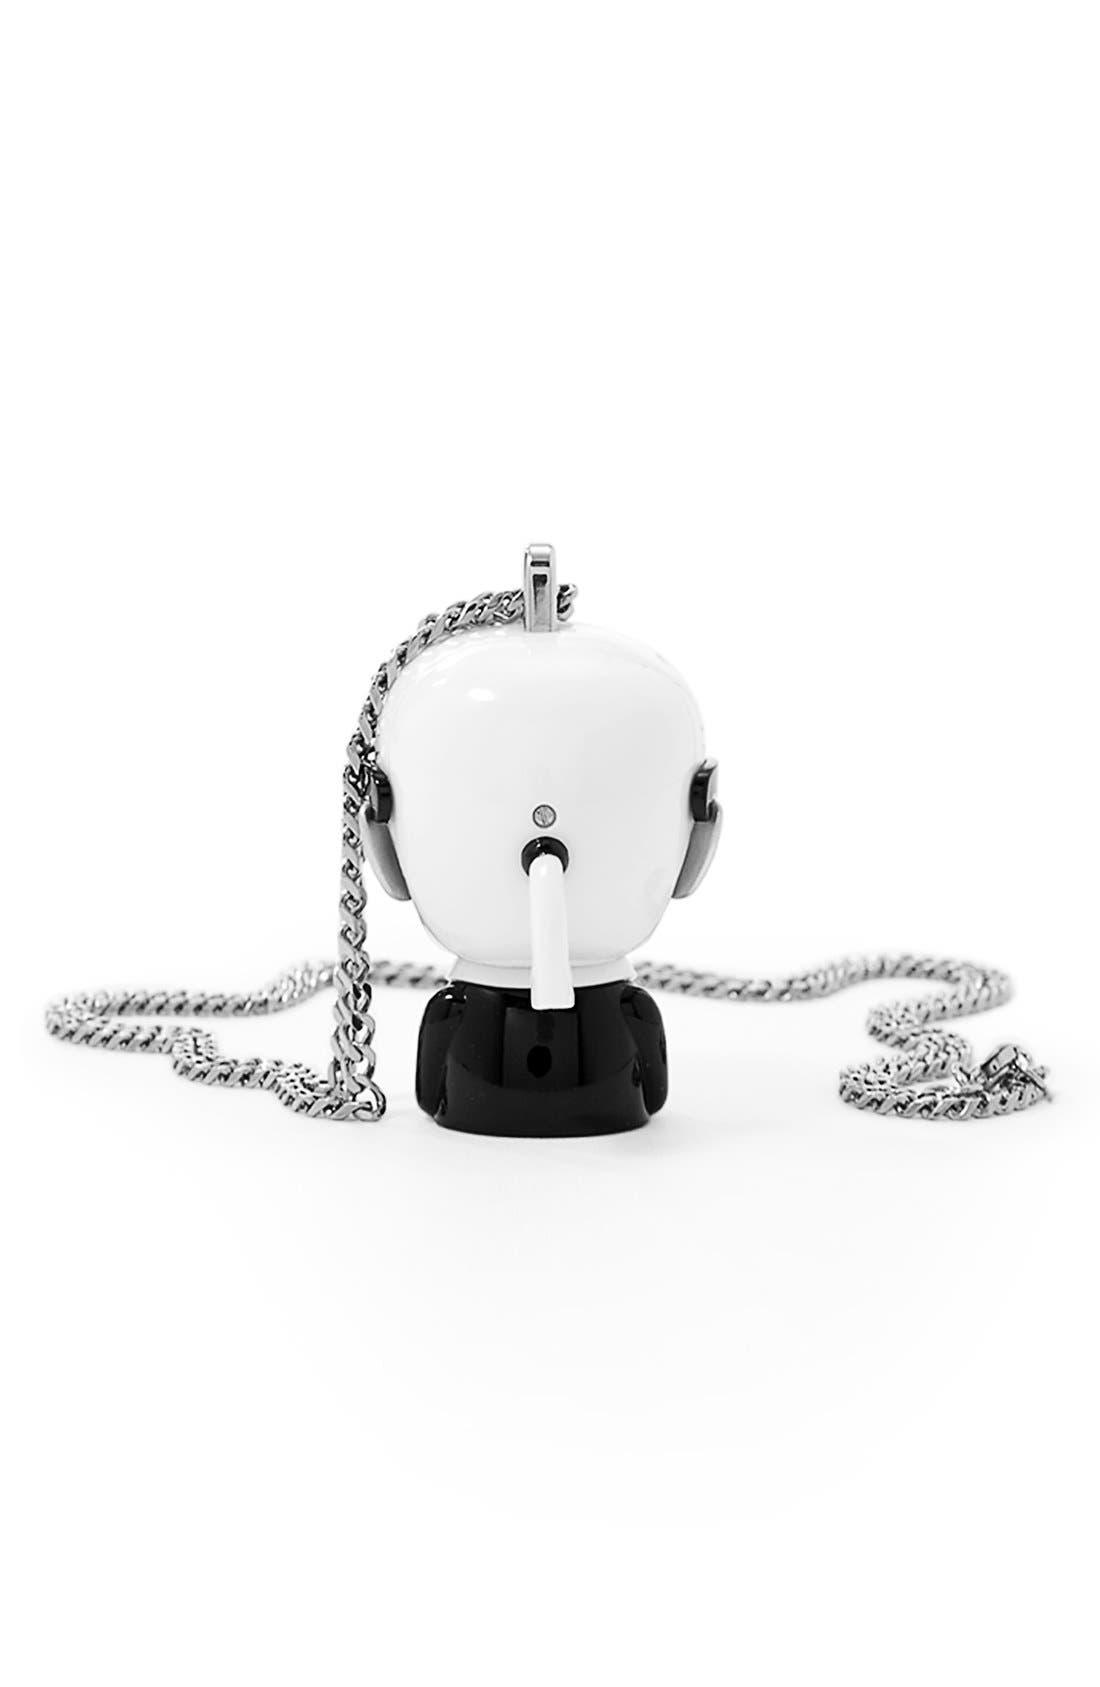 'tokidoki' Digital Necklace Watch, 37mm x 51mm,                             Alternate thumbnail 5, color,                             Silver/ Black/ White